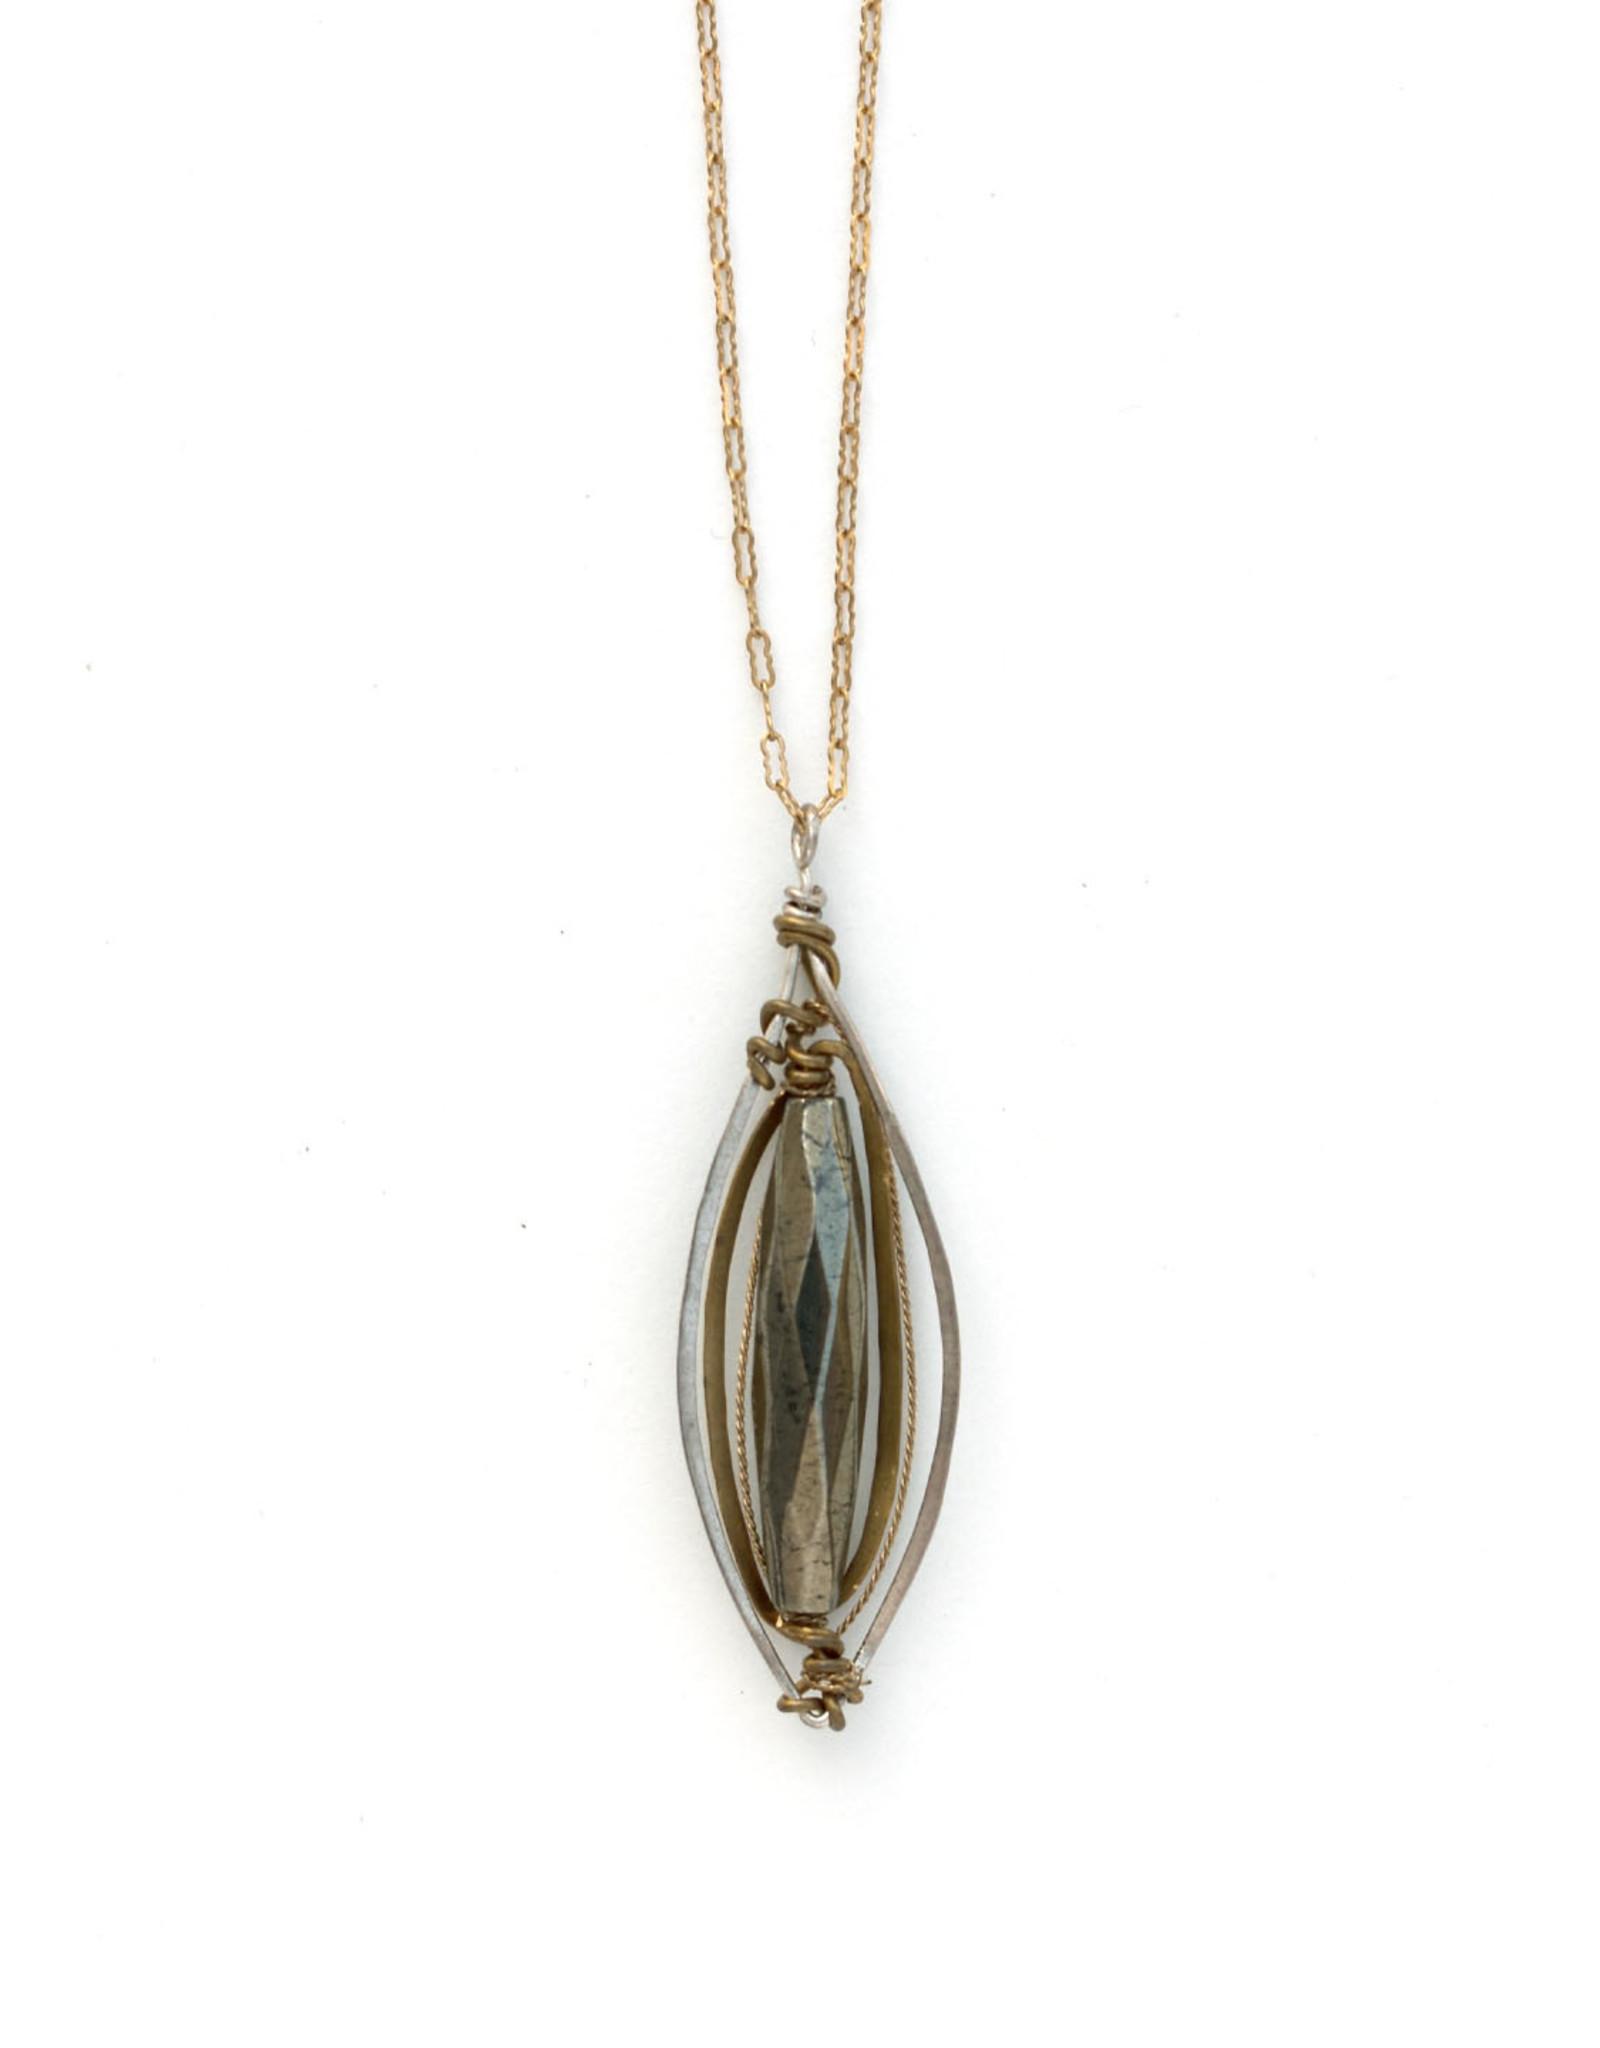 Hemetite Marquise Necklace